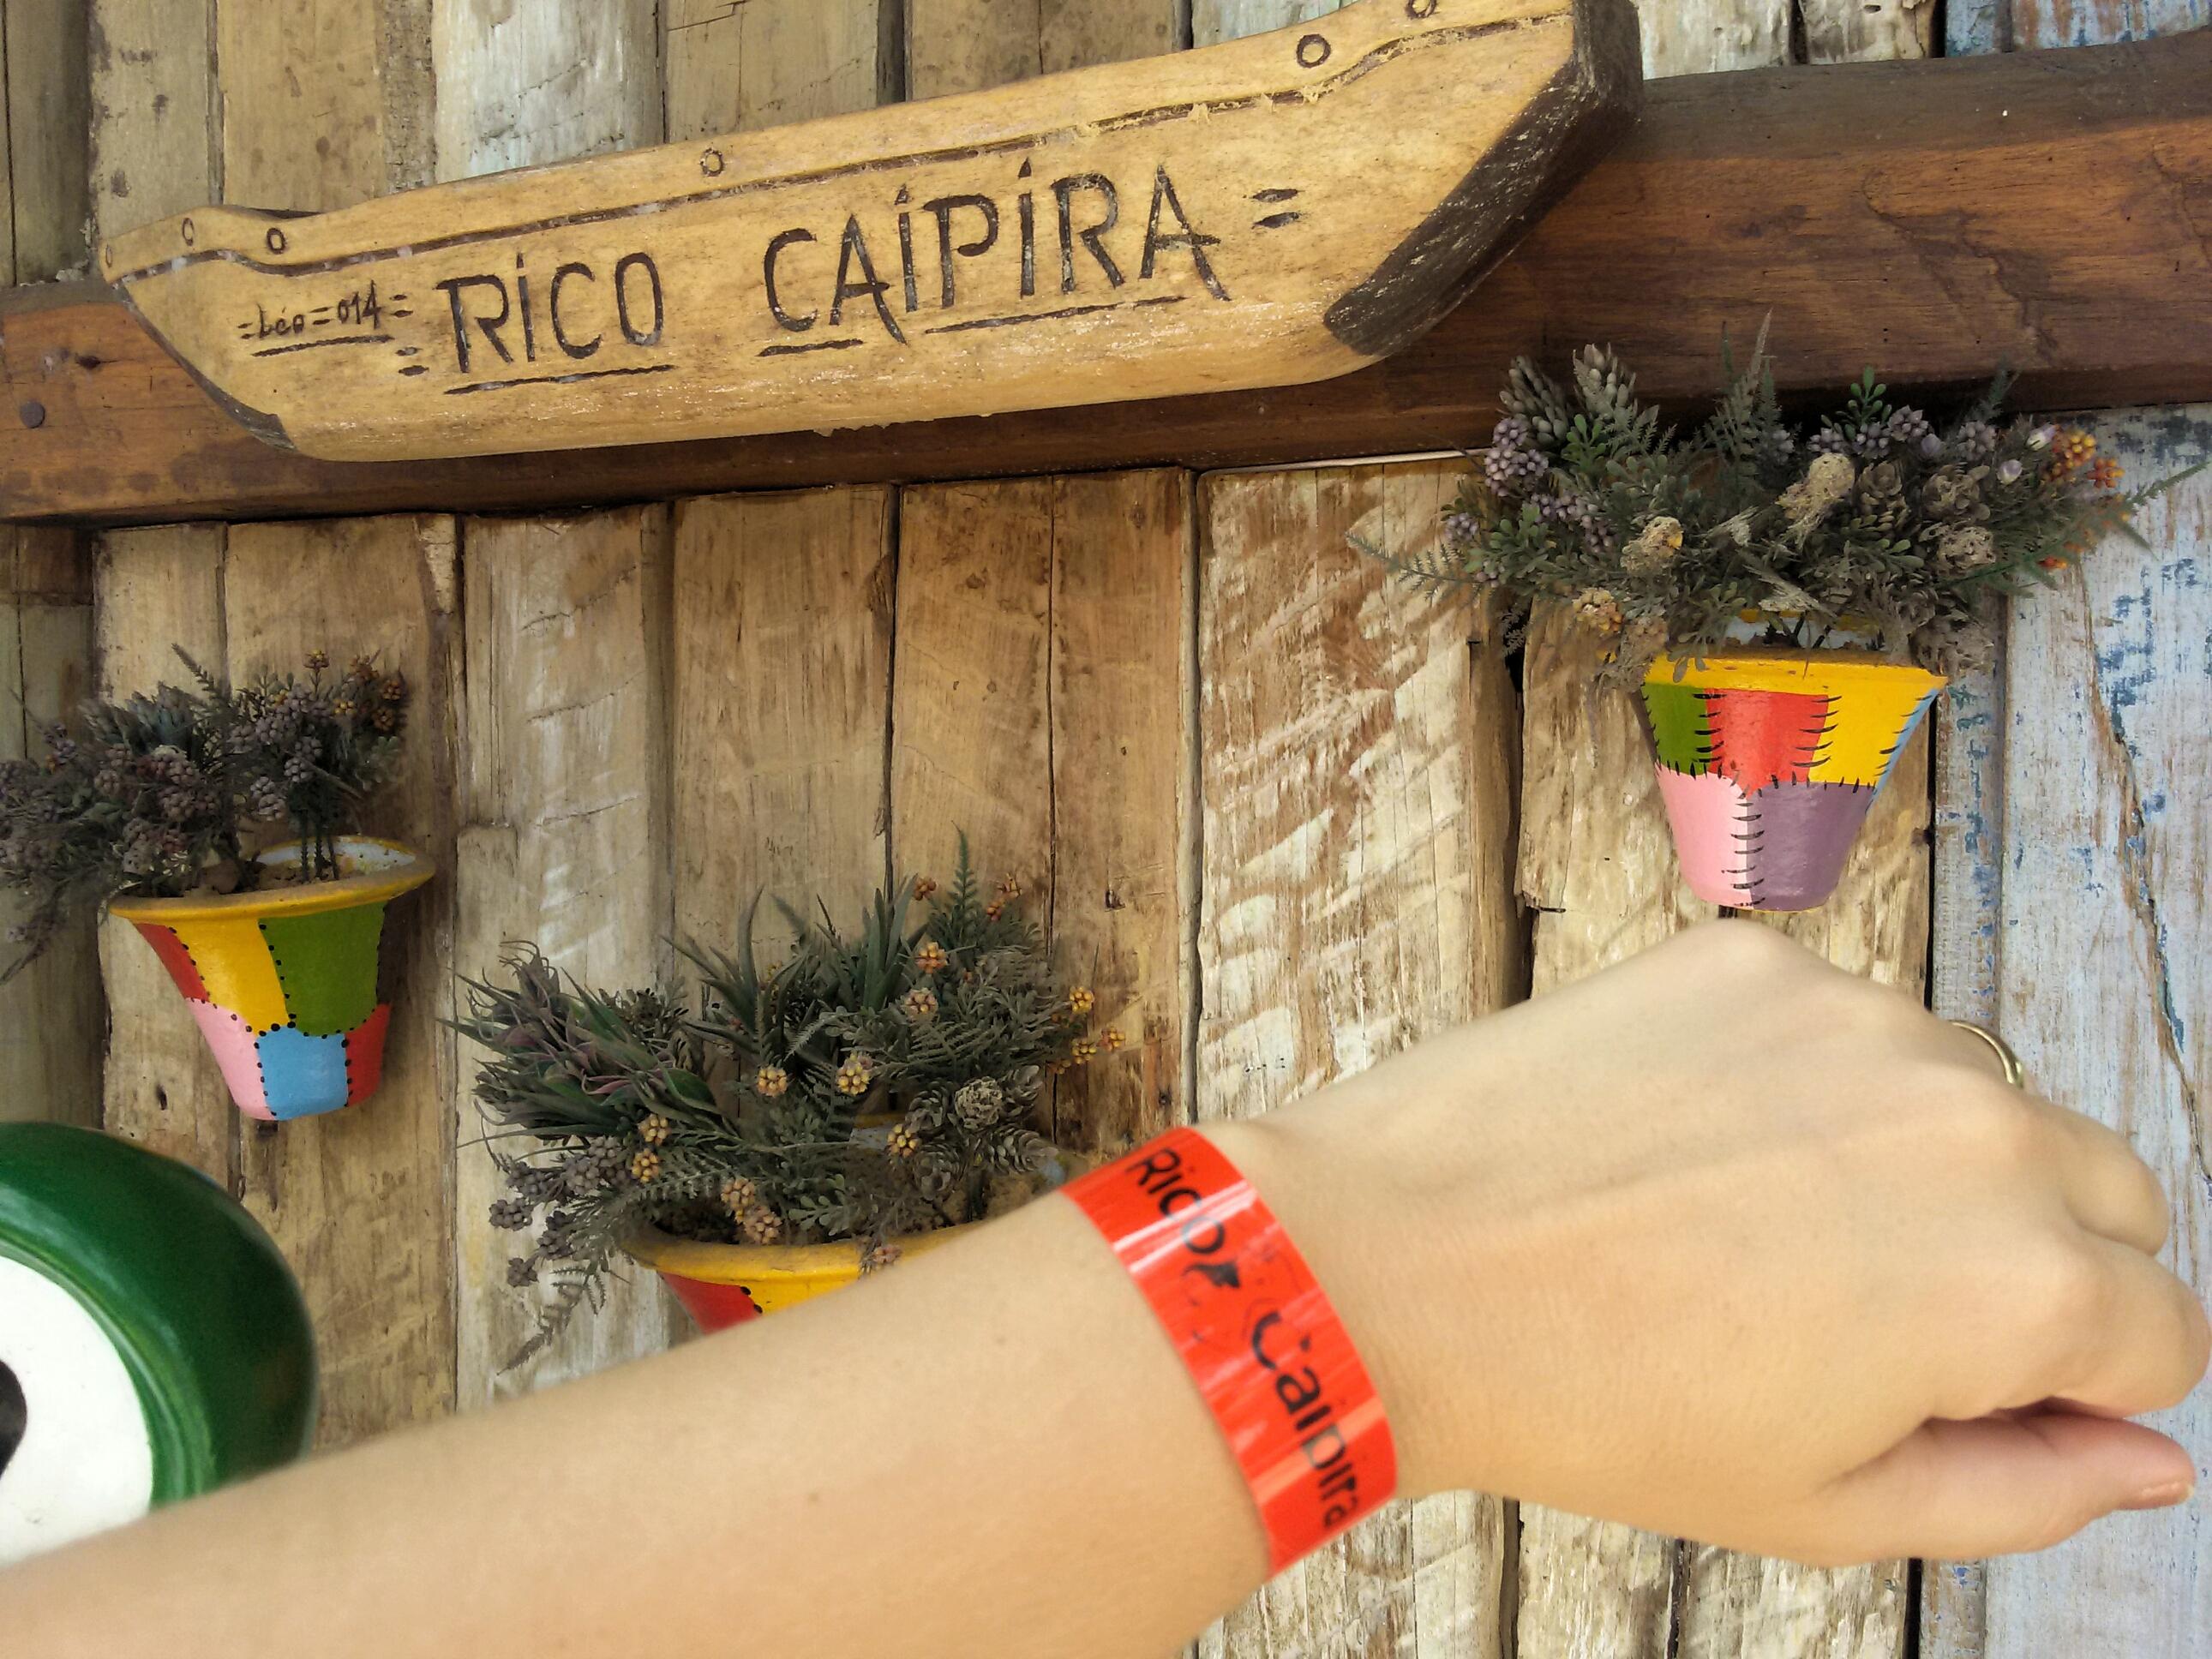 Rico Caipira